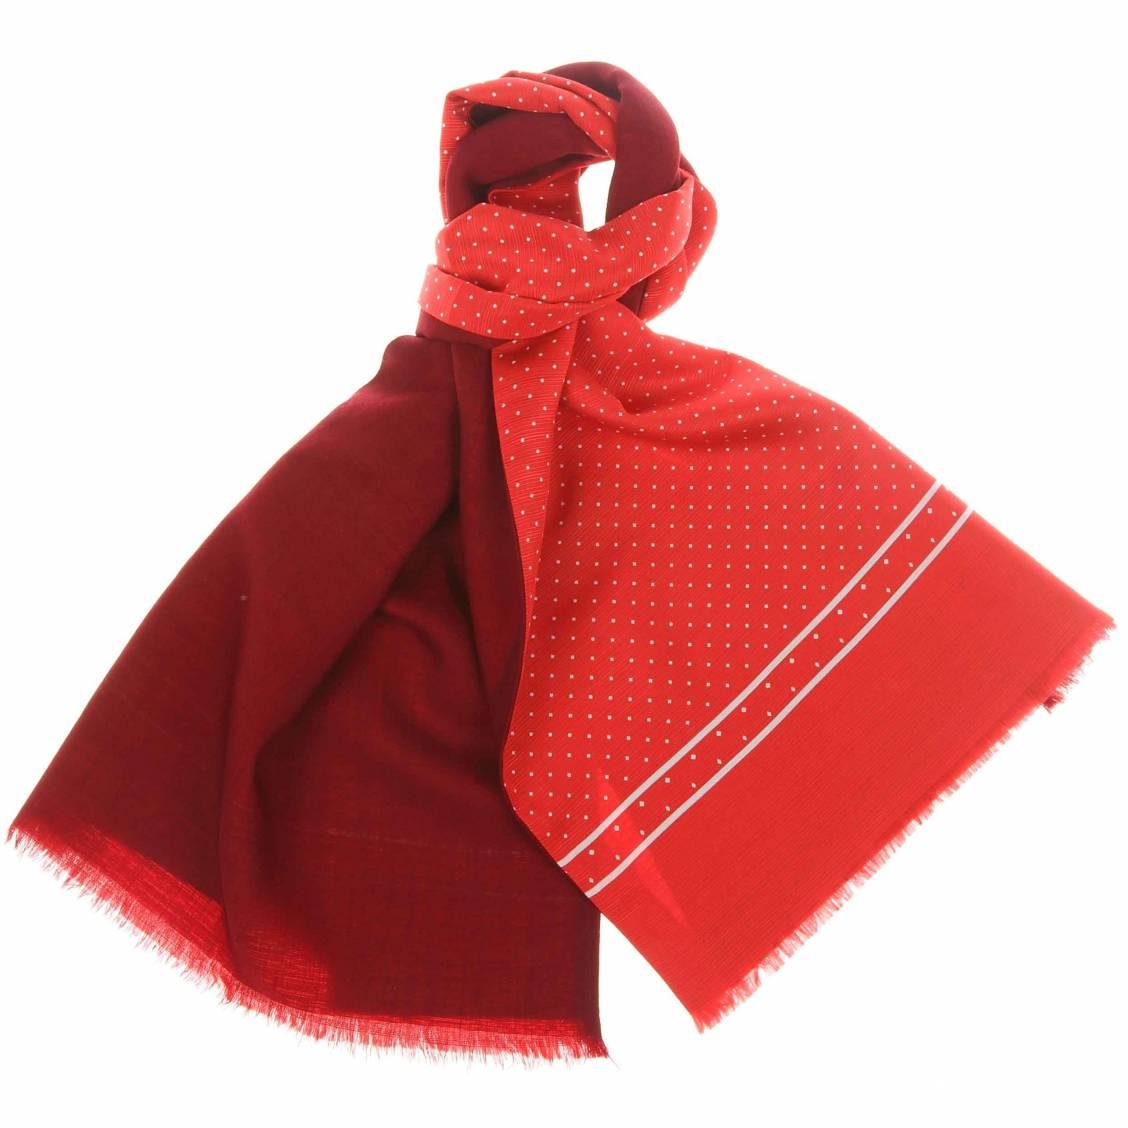 echarpe en laine et soie rouge pois blancs rue des hommes. Black Bedroom Furniture Sets. Home Design Ideas